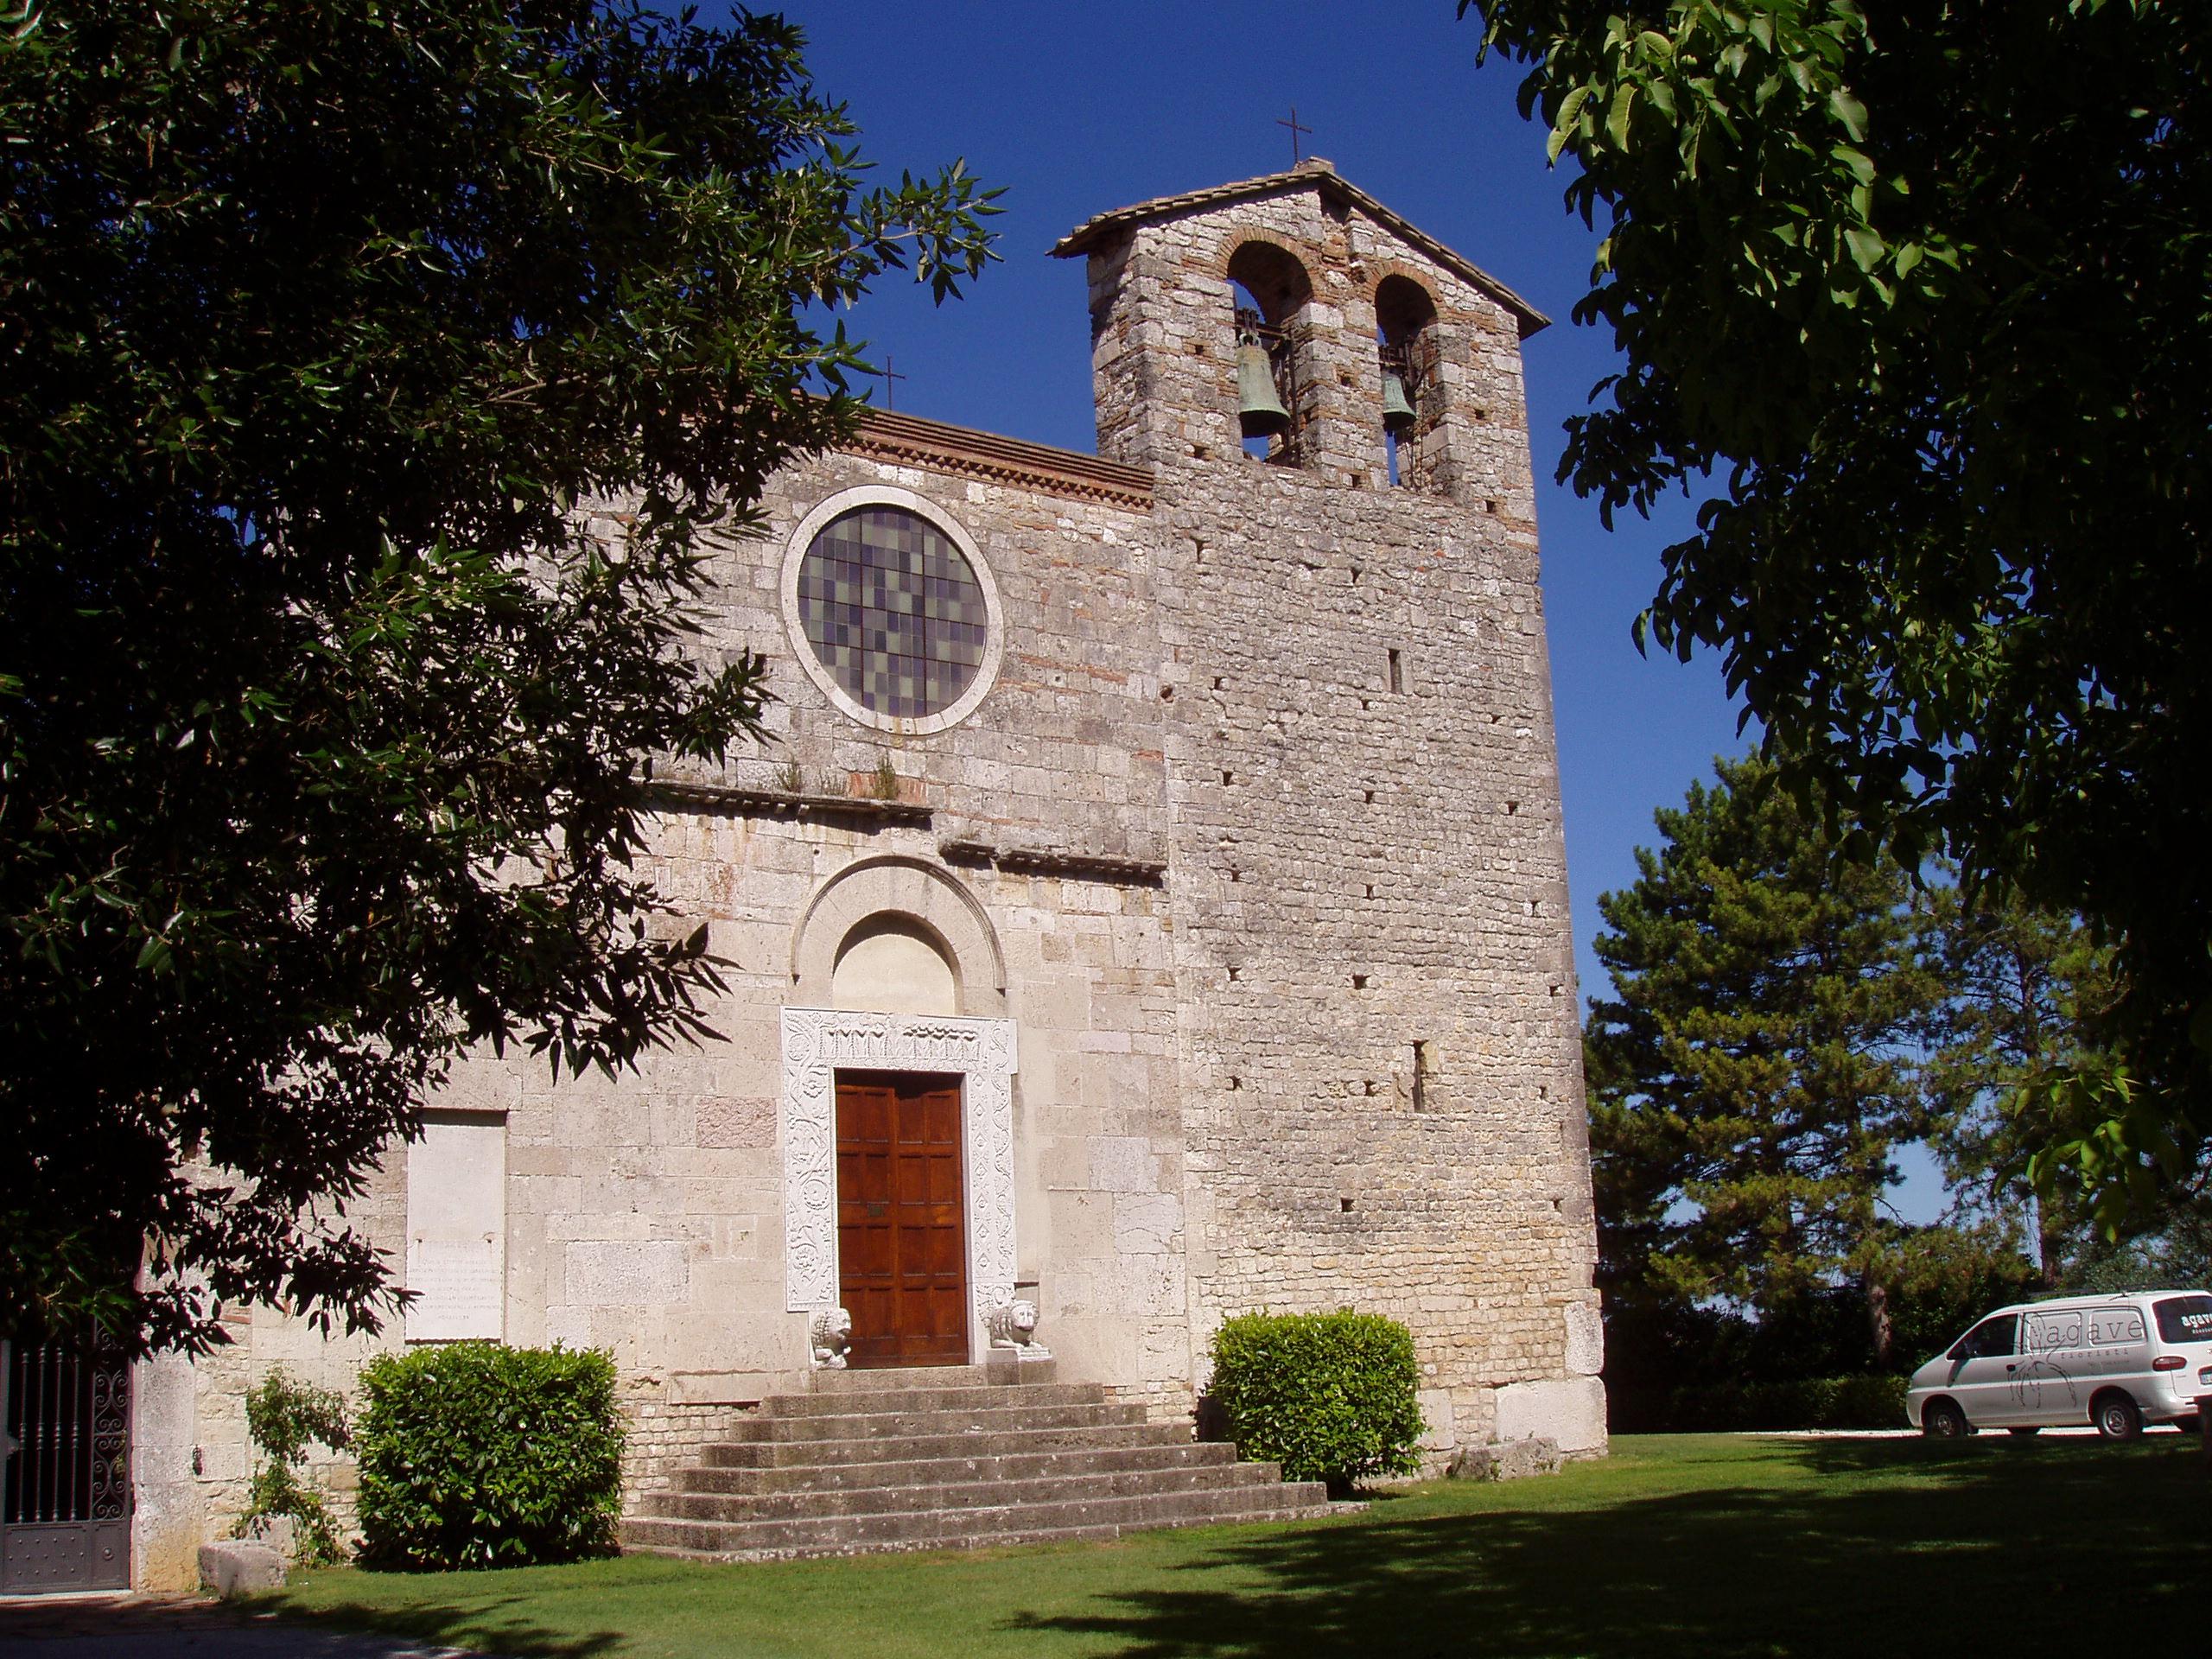 San Nicolo, San Gemini